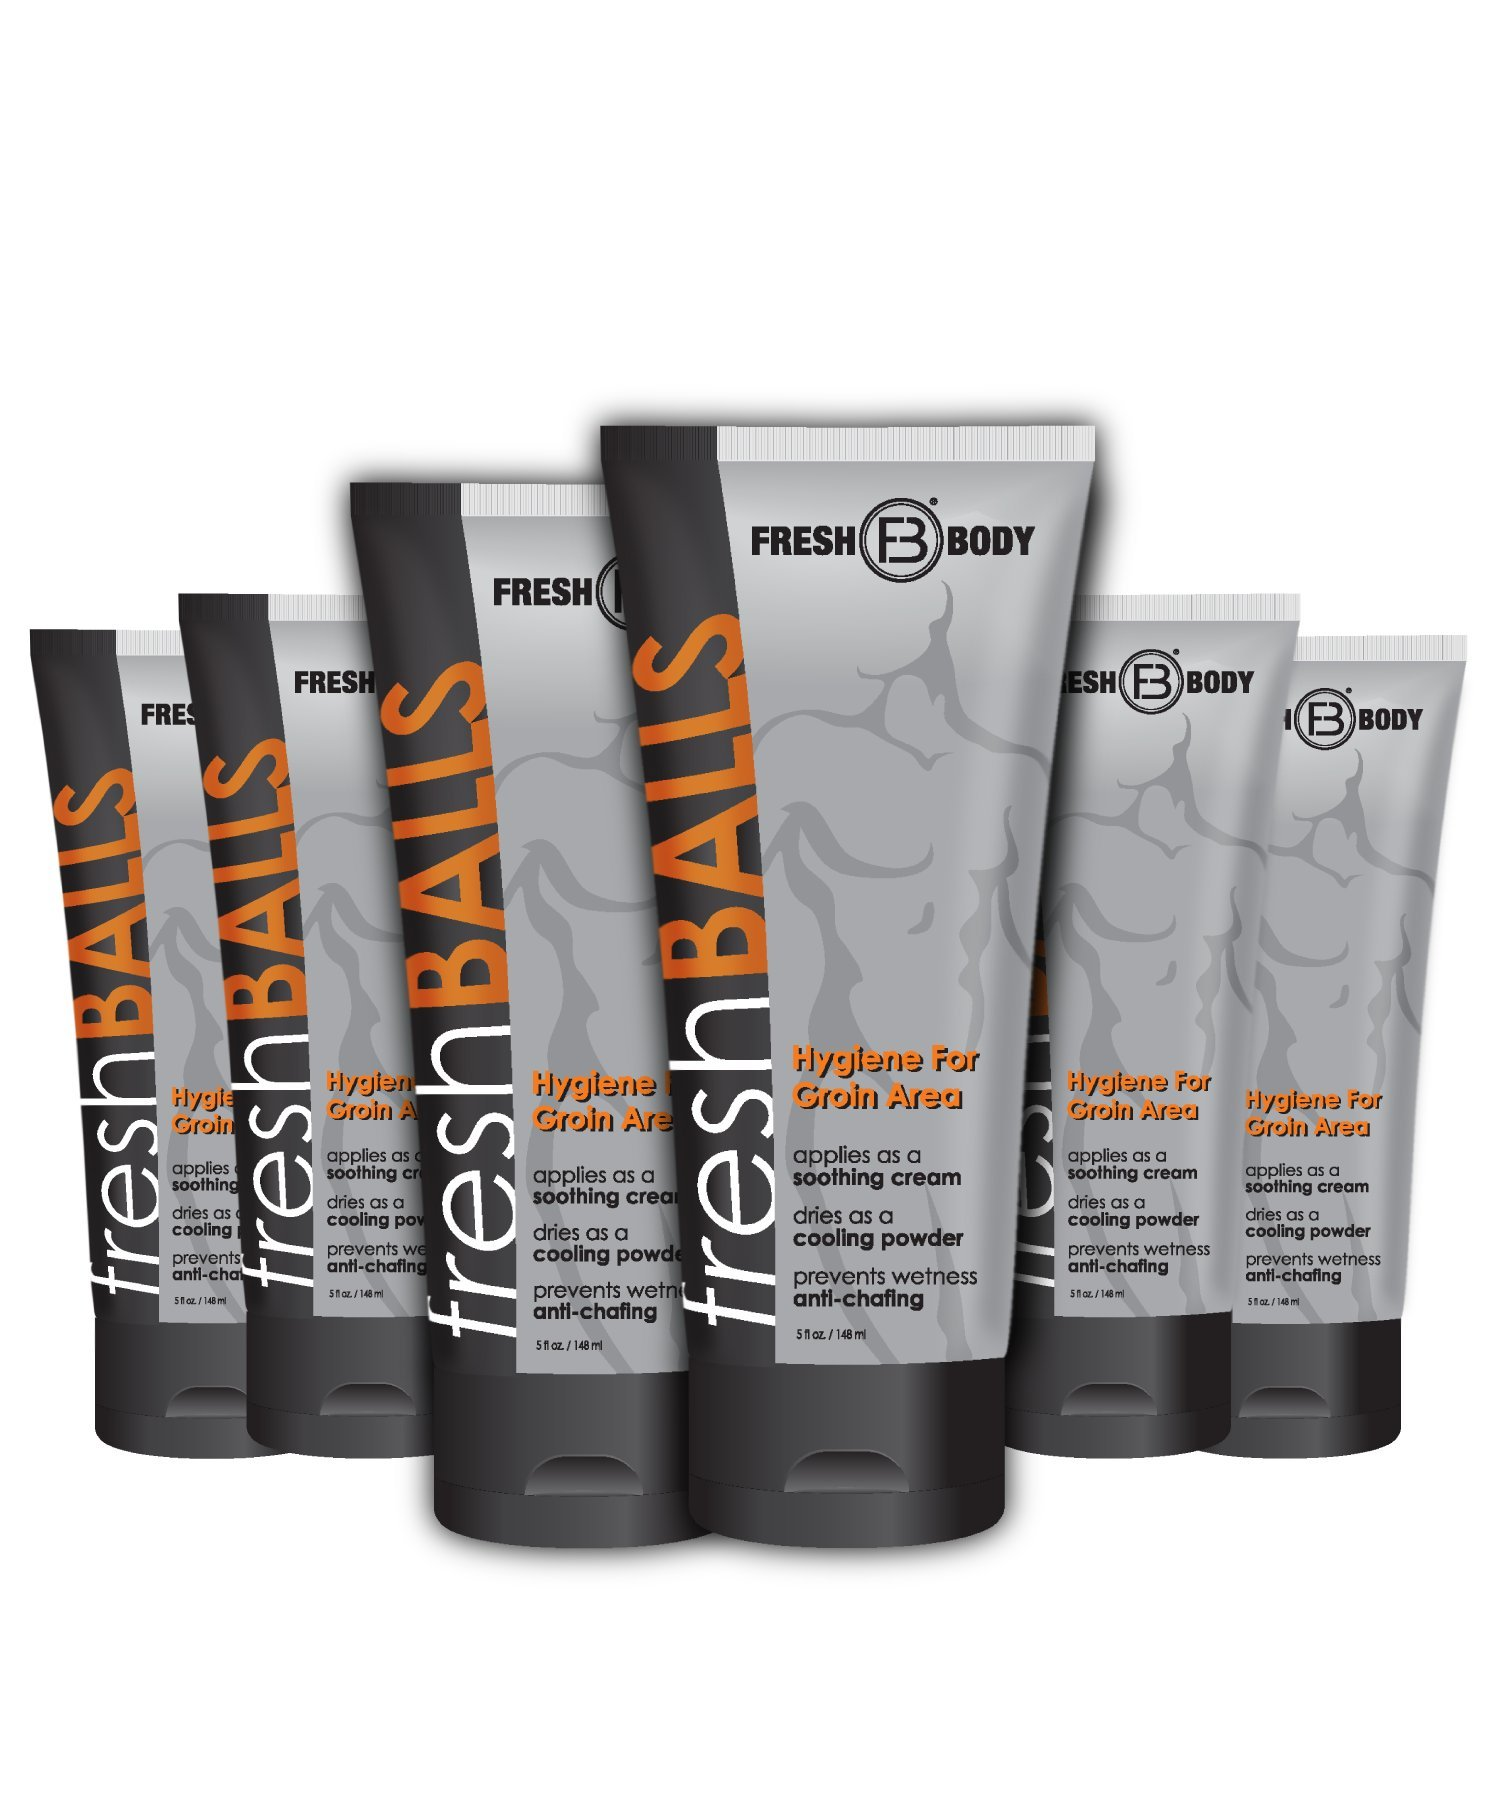 FRESH BALLS Male Hygiene Antiperspirant Lotion 3.4 oz 6 PACK by Fresh Body FB